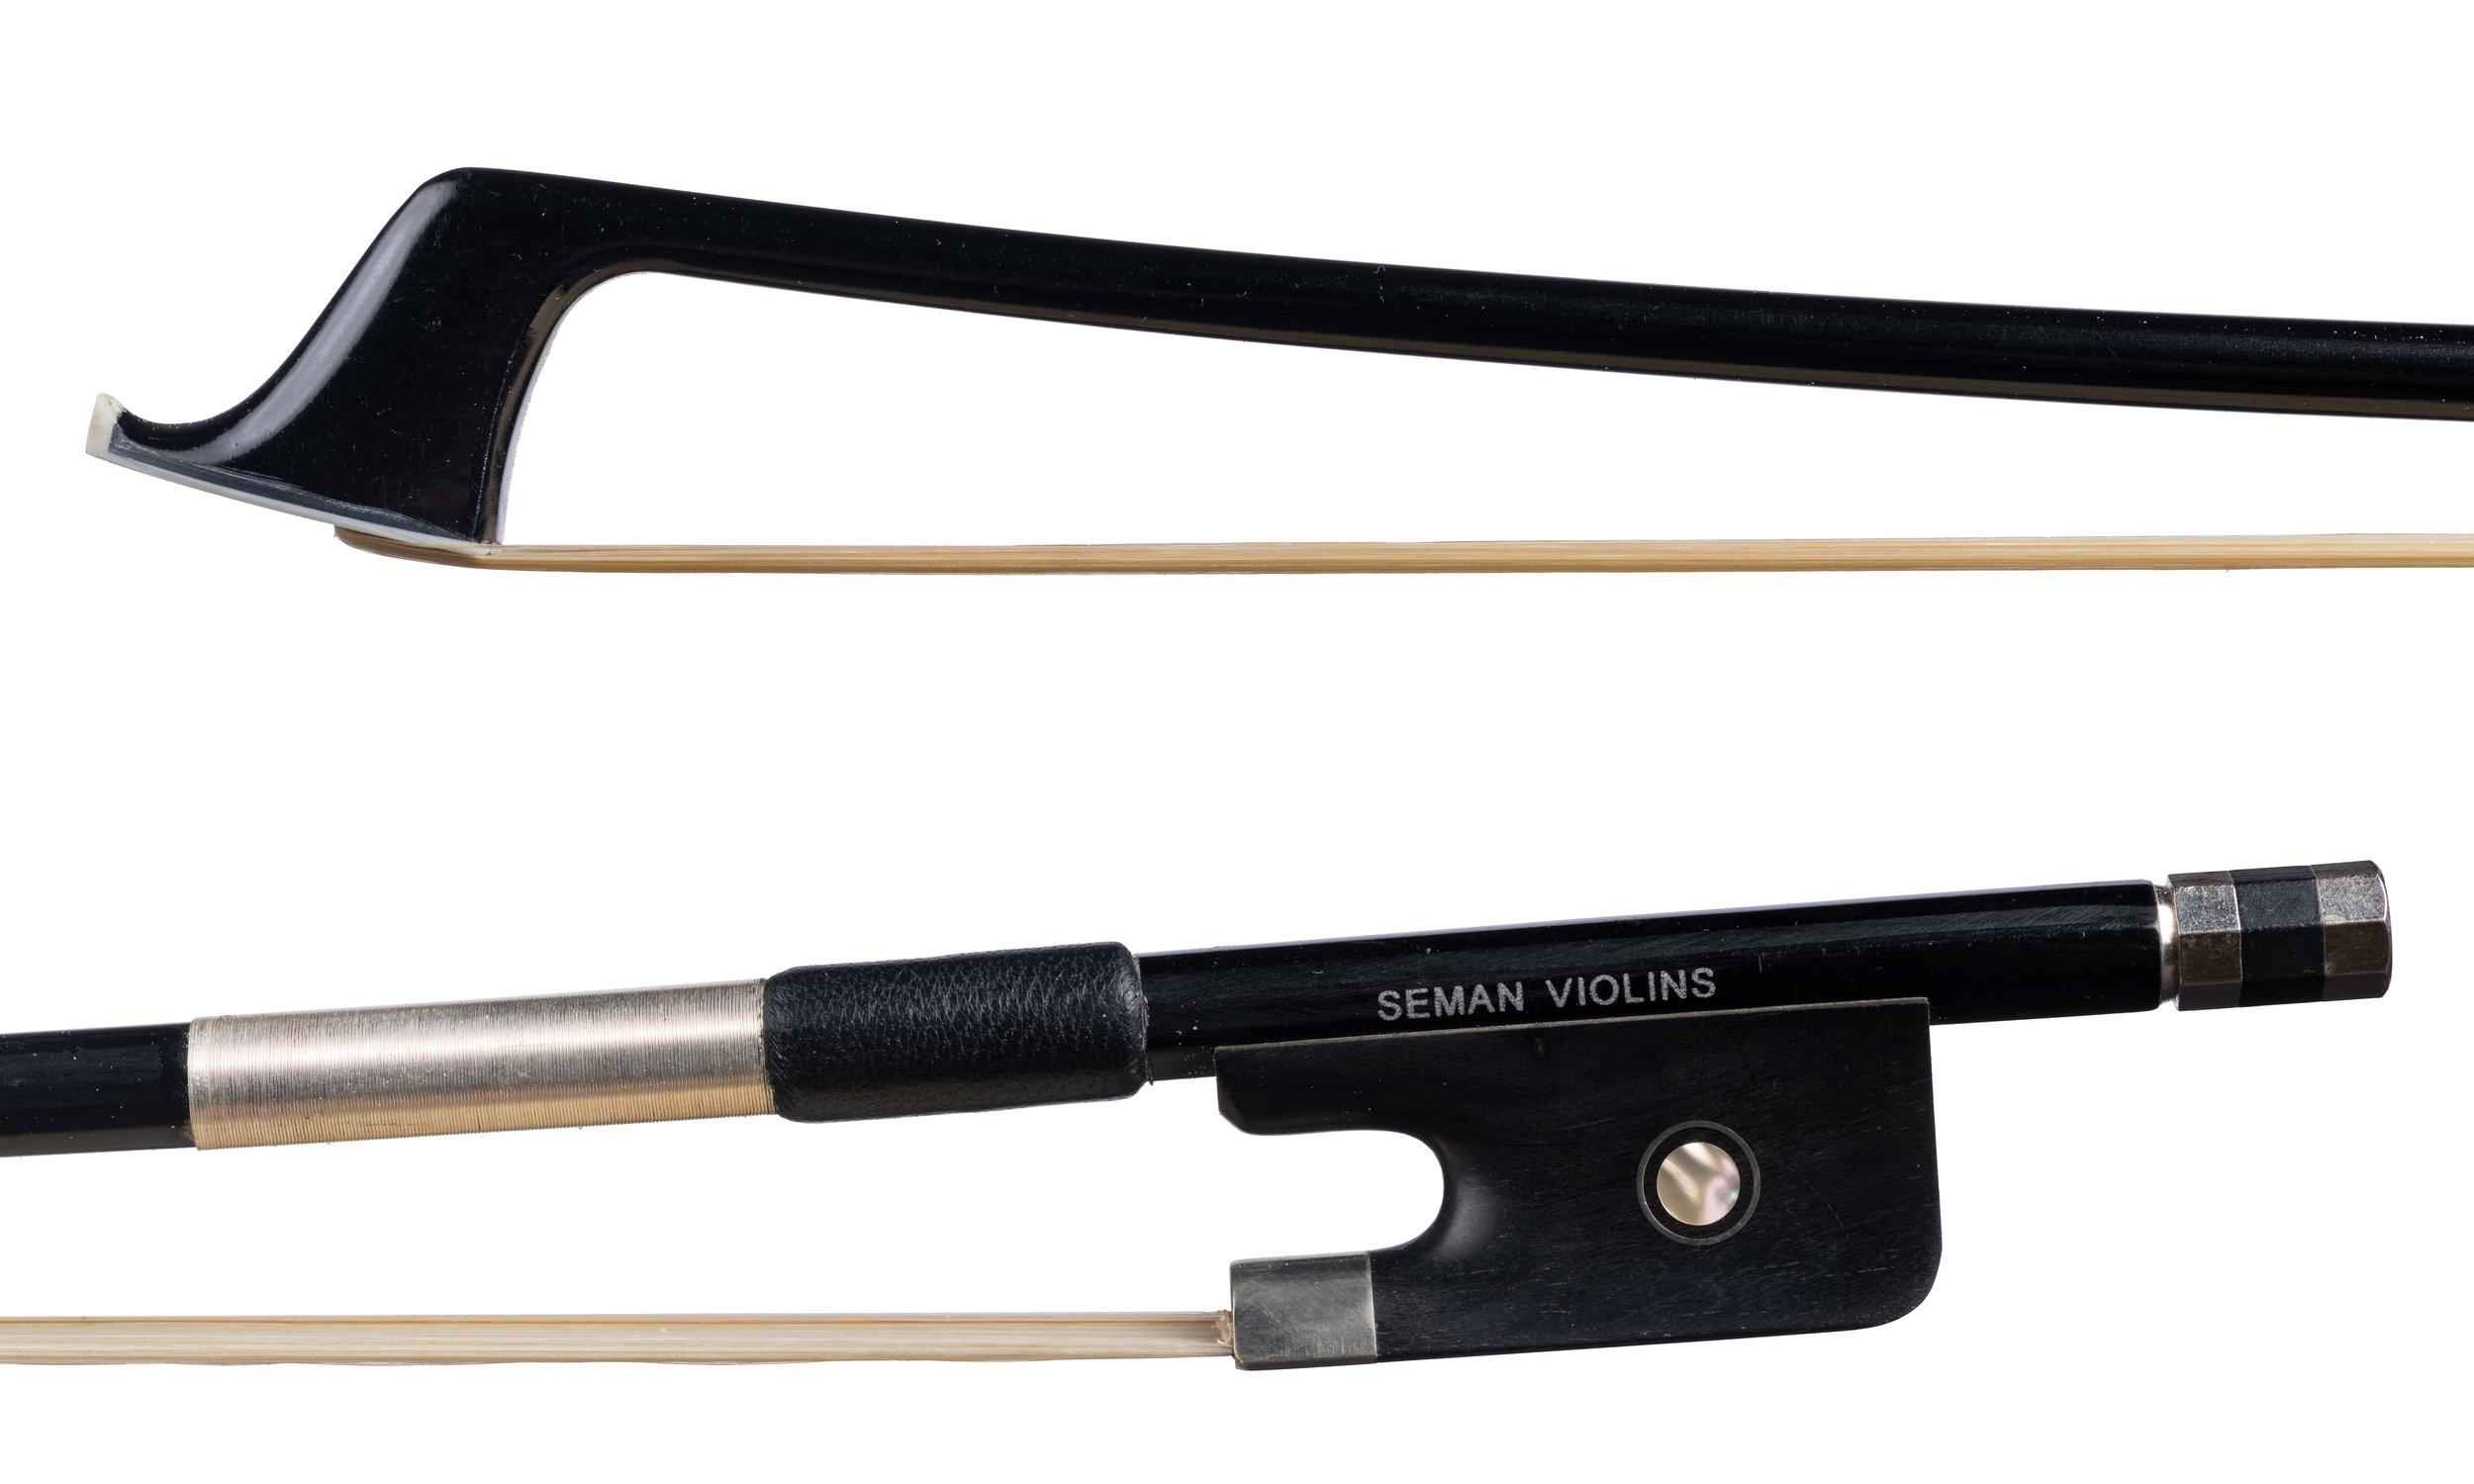 Seman+Violins+CF+ce+bow.jpg